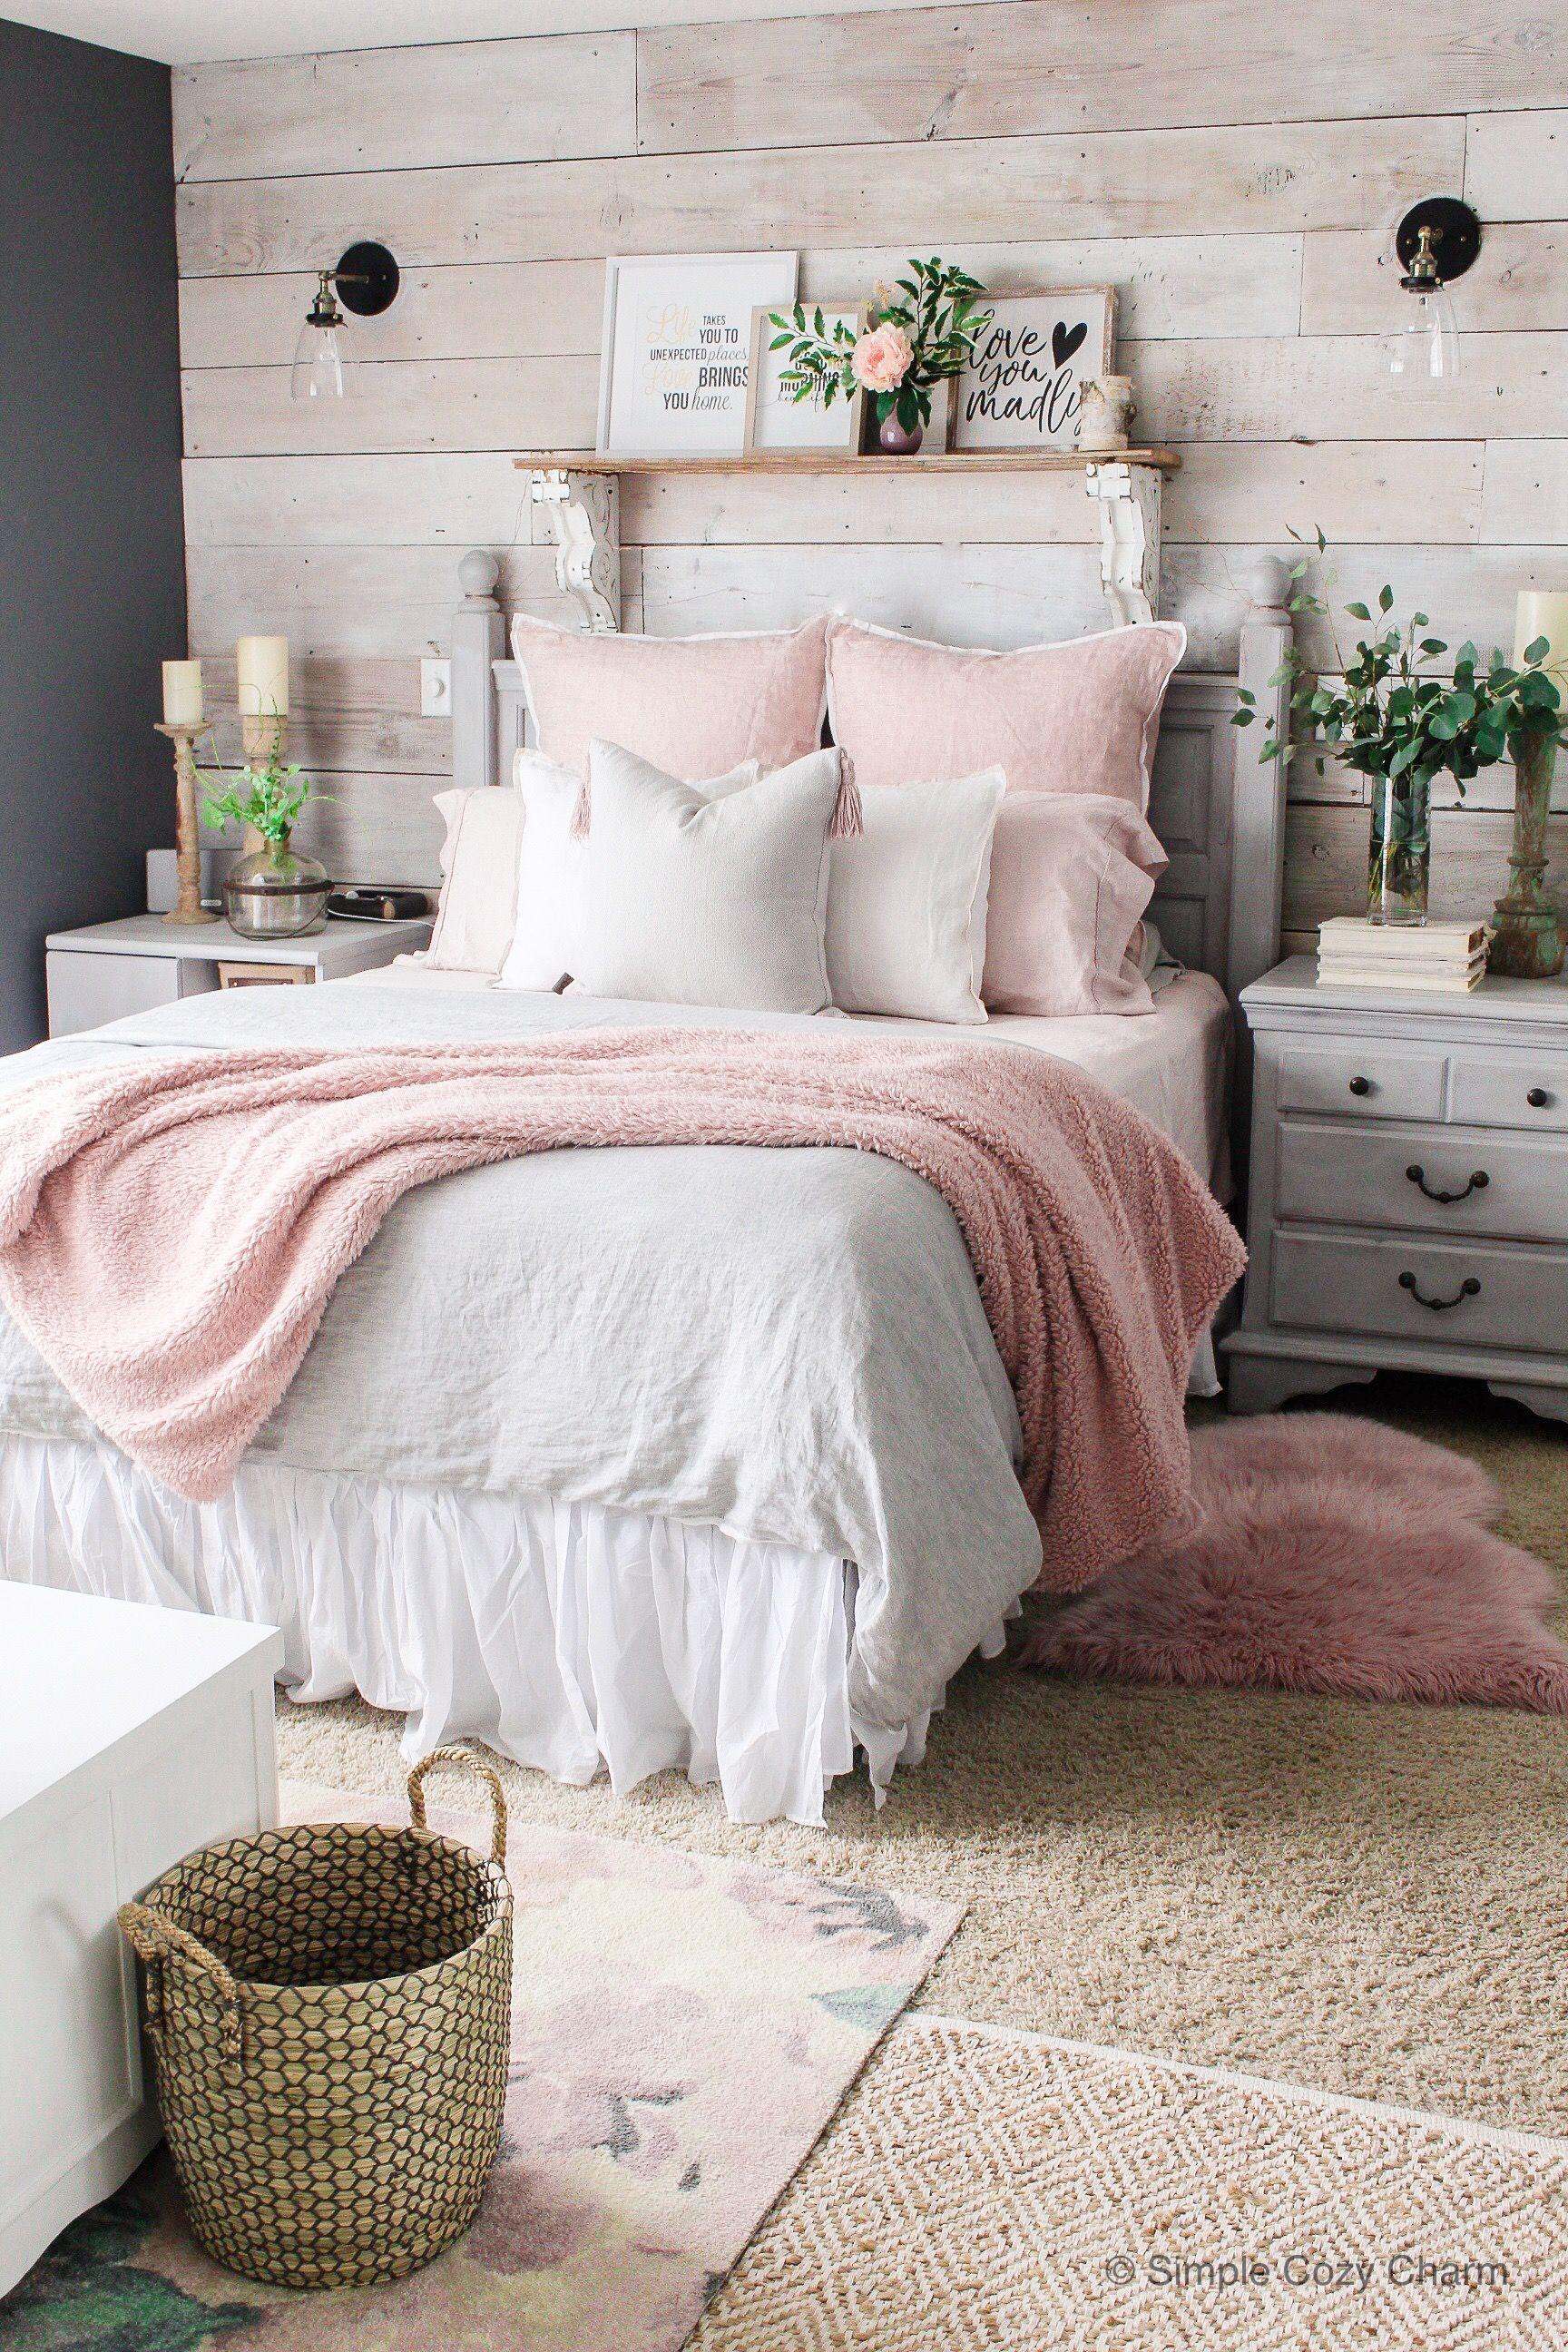 Mid-Winter Bedroom Facelift - Simple Cozy Charm | Bedroom ...